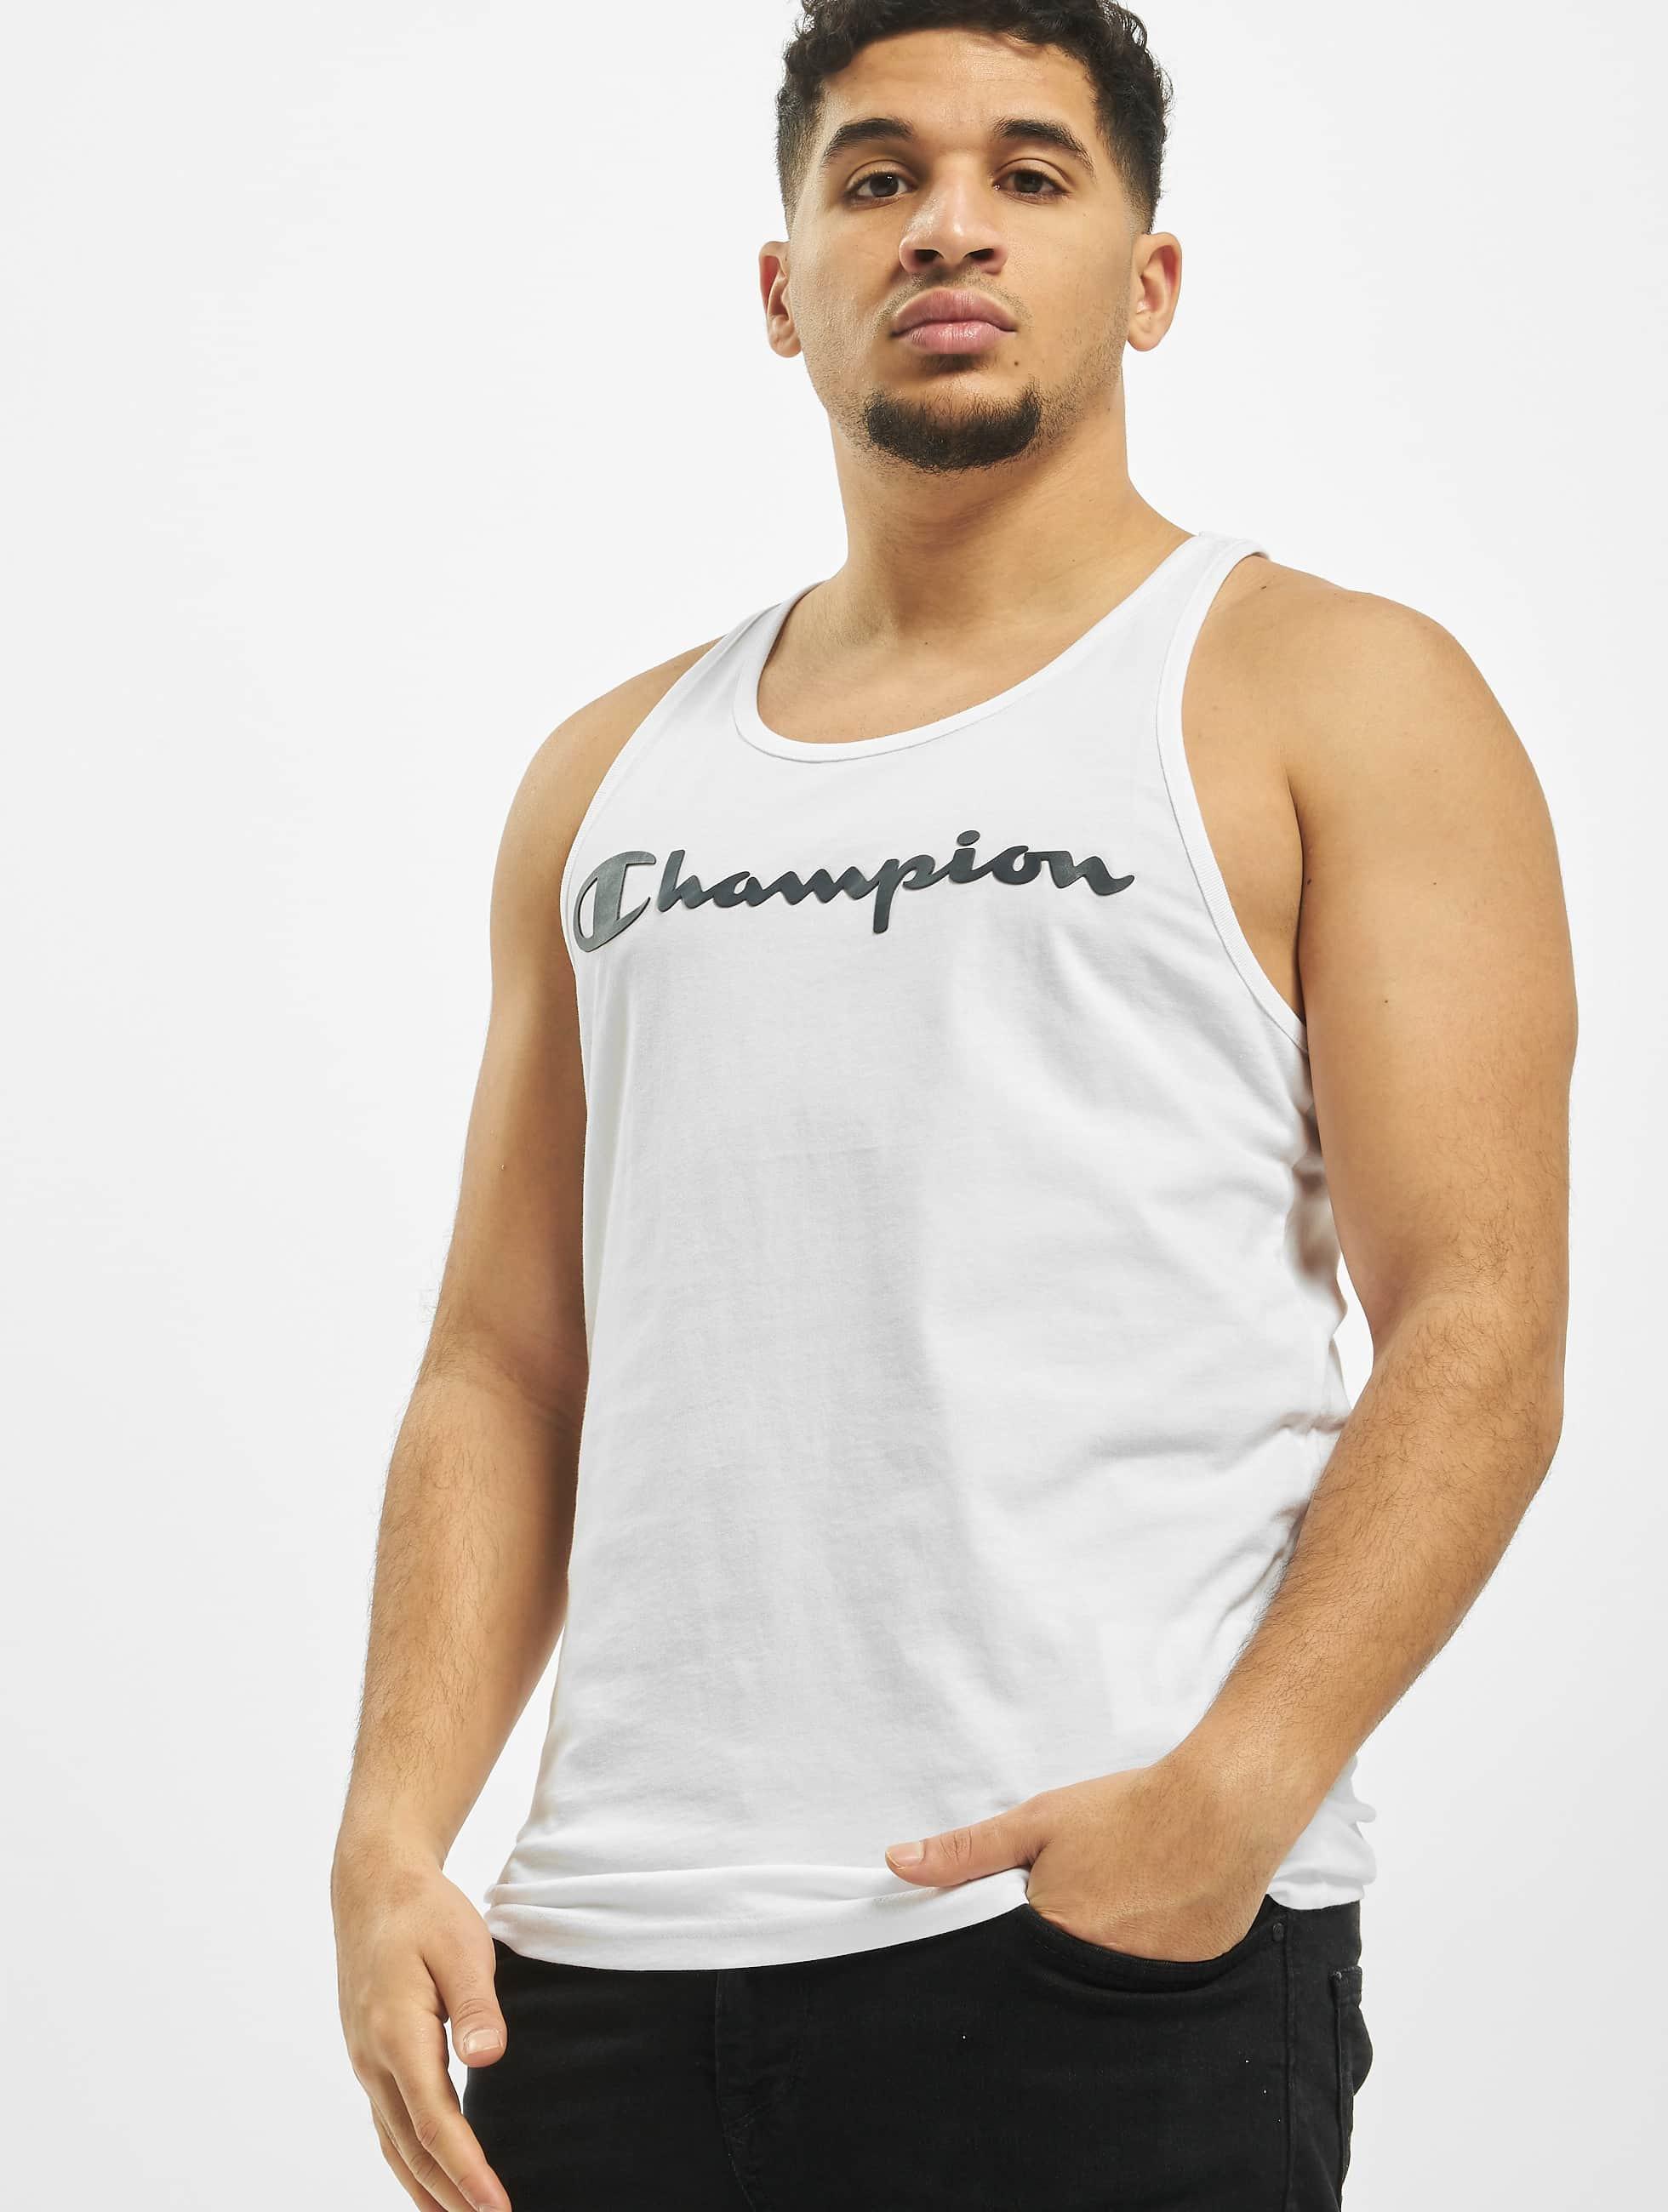 607451cbe Champion Classic Tank Top White